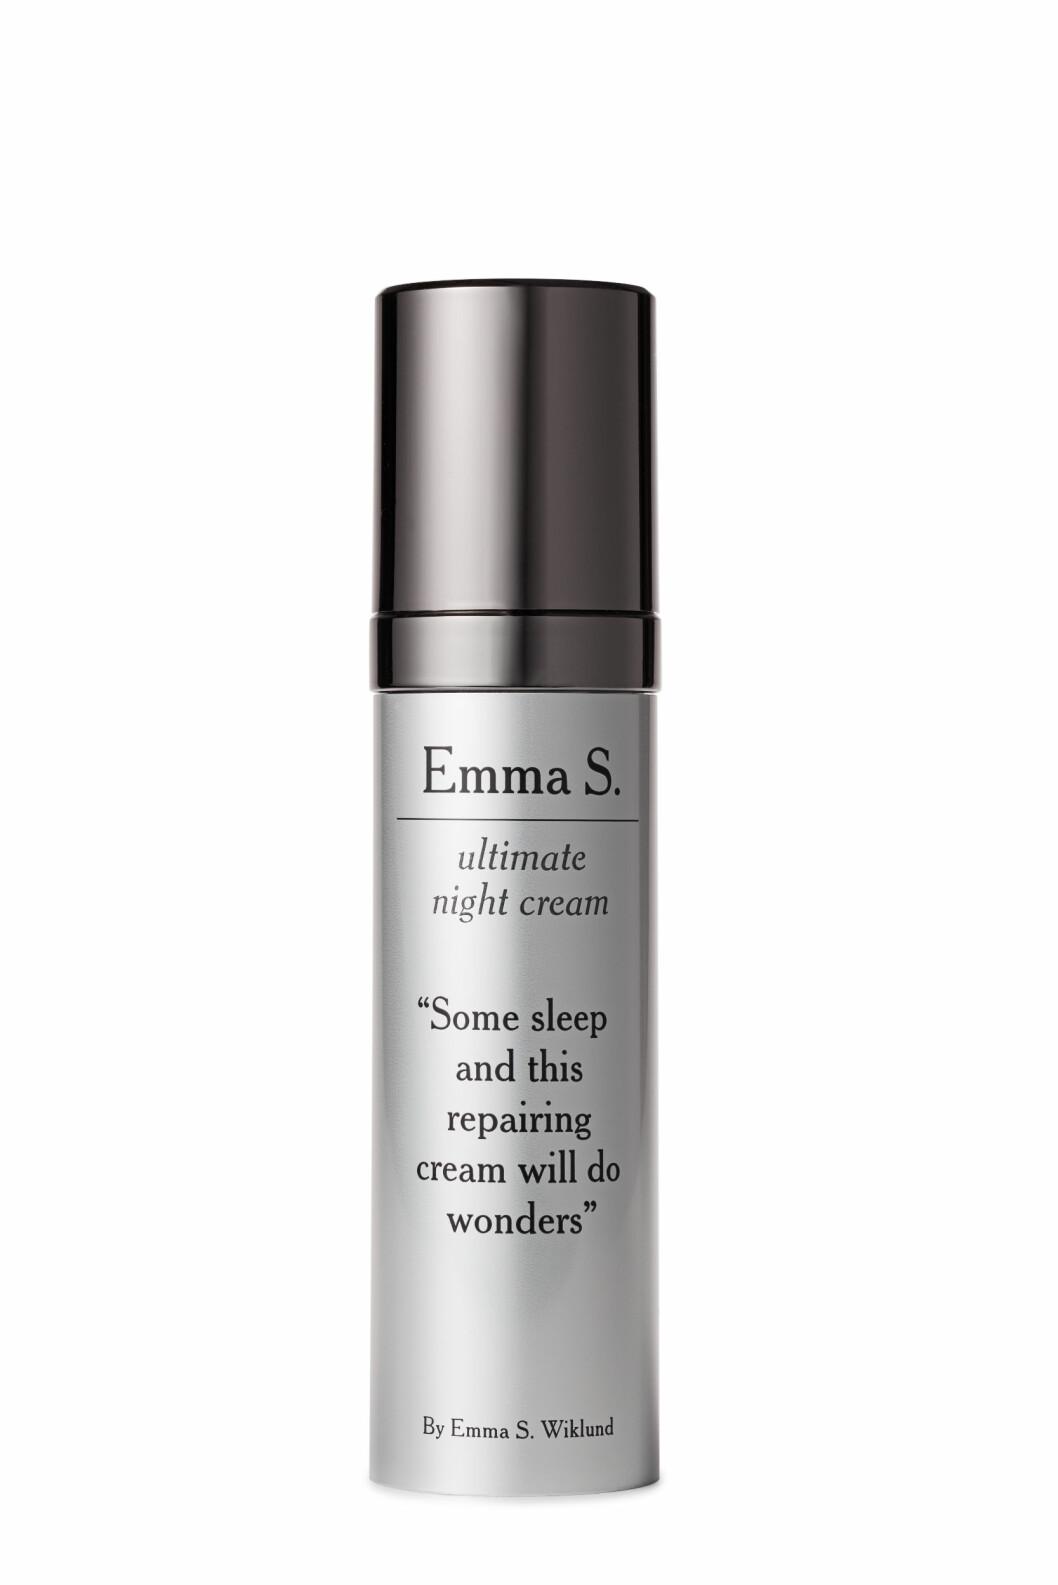 Med vitamin A-derivat og oppstrammende peptider (kr 700, Emma S, Ultimate Night Cream)